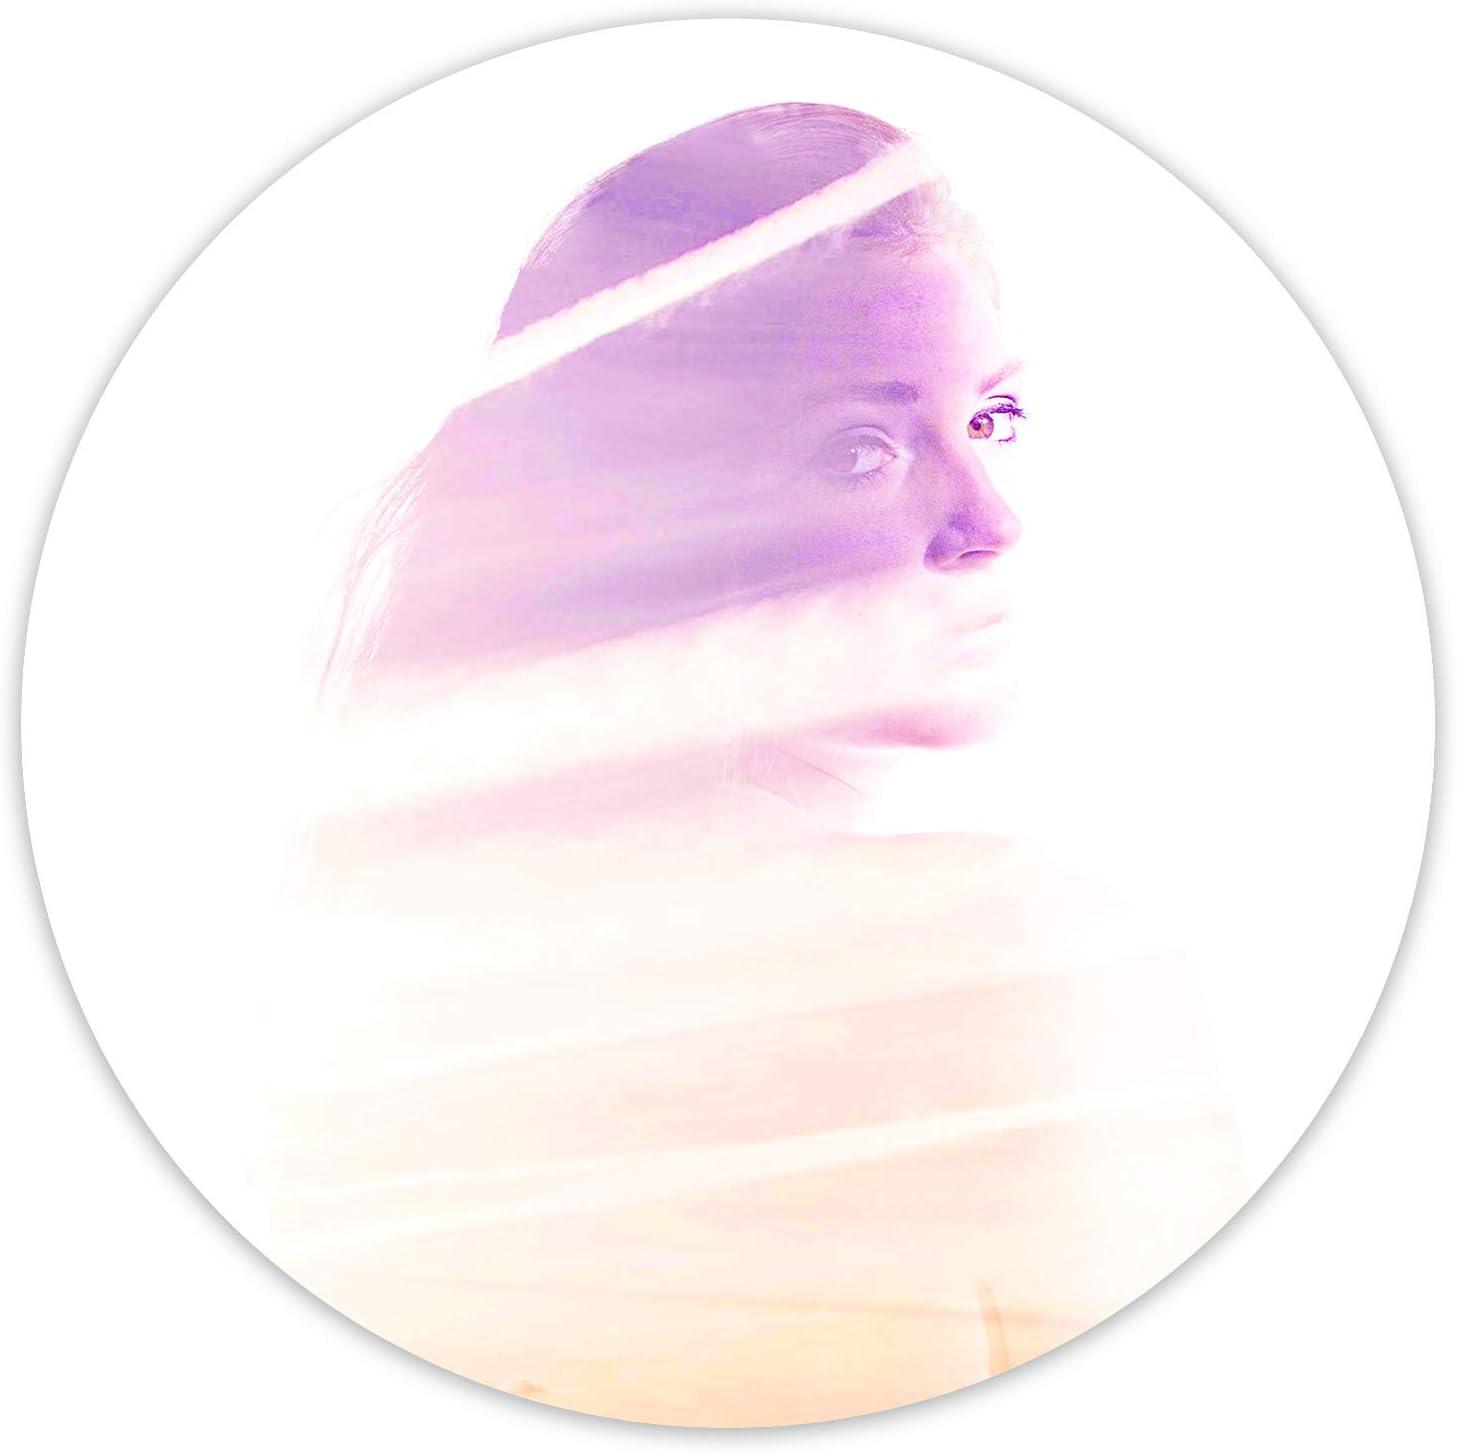 Feeby Cuadro Circulo Imagen XXL Mujer Impresión de Arte Abstracto Retrato Blanco 80 cm